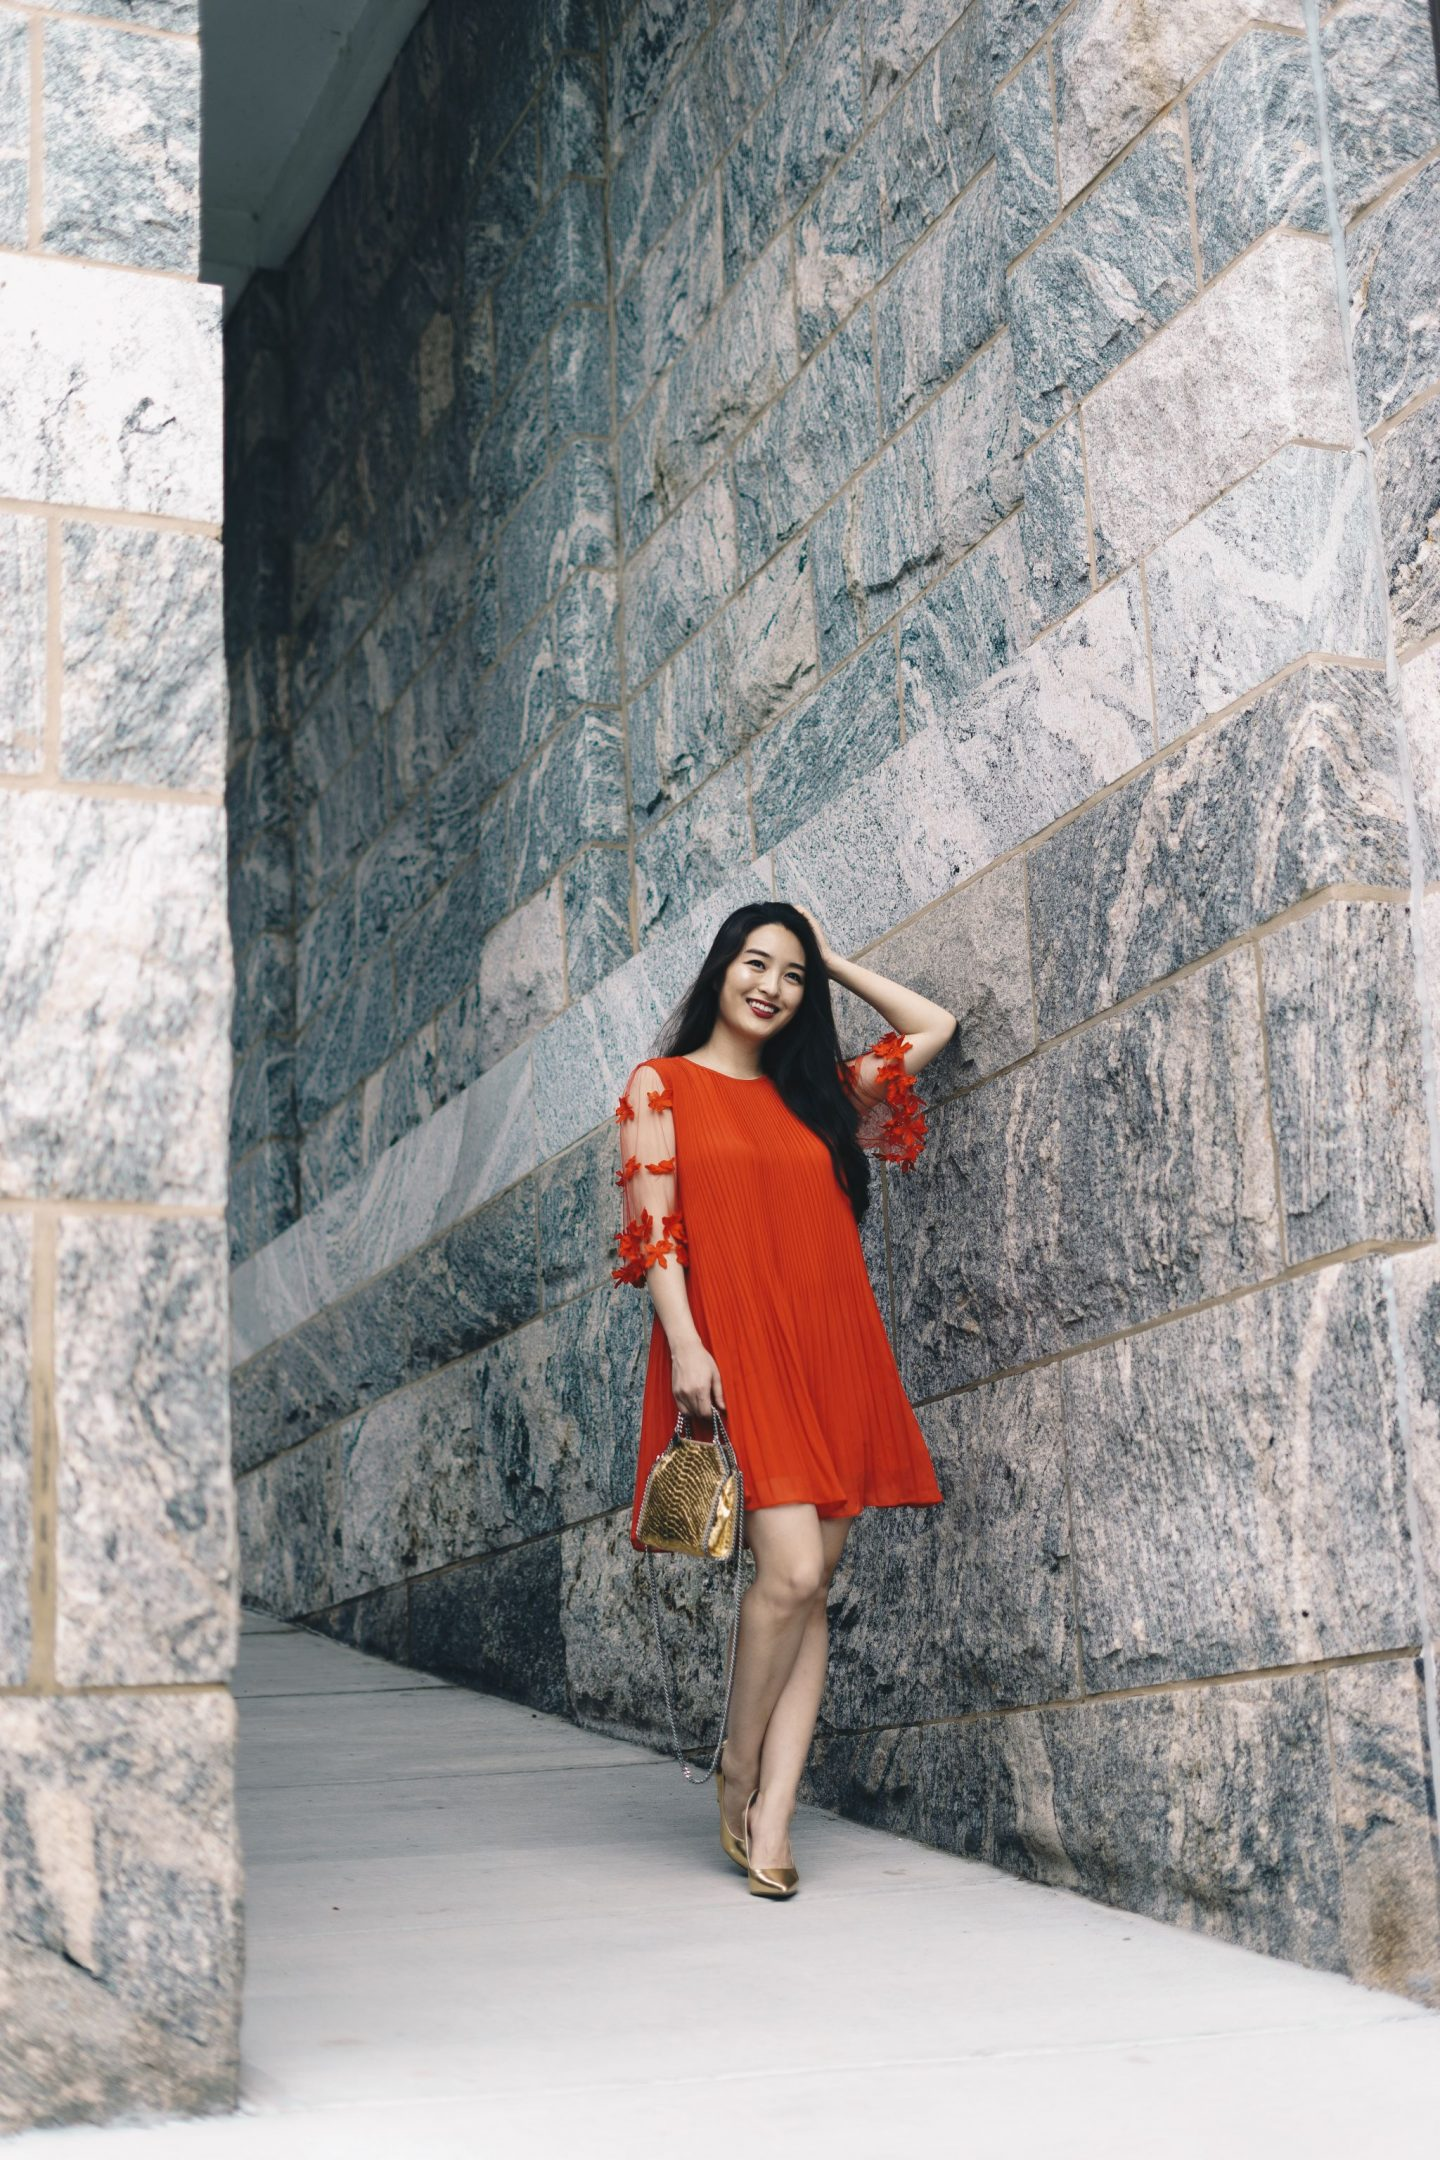 fashion blogger models red dress